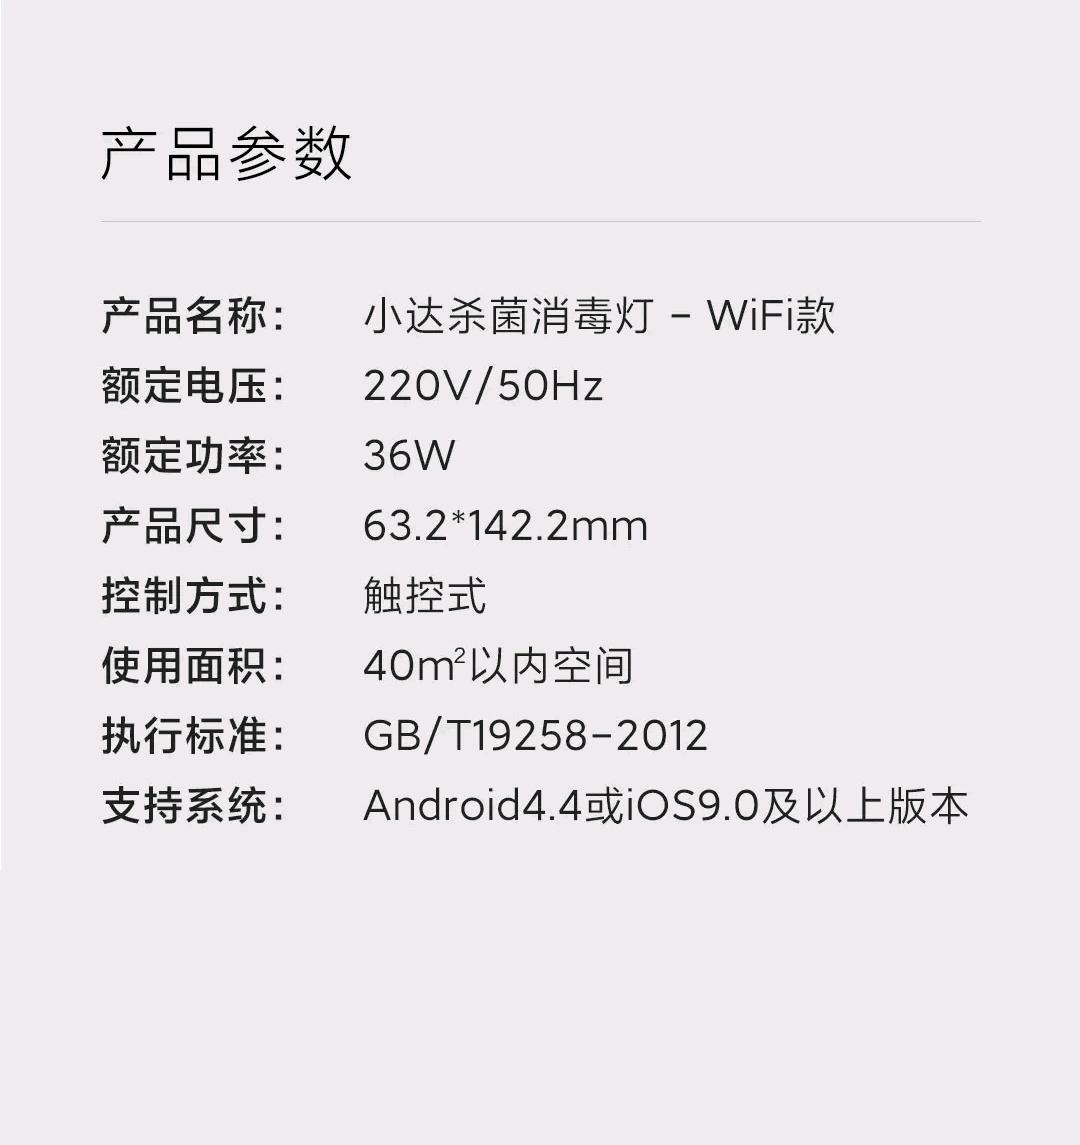 1600x_image.png?1606394769